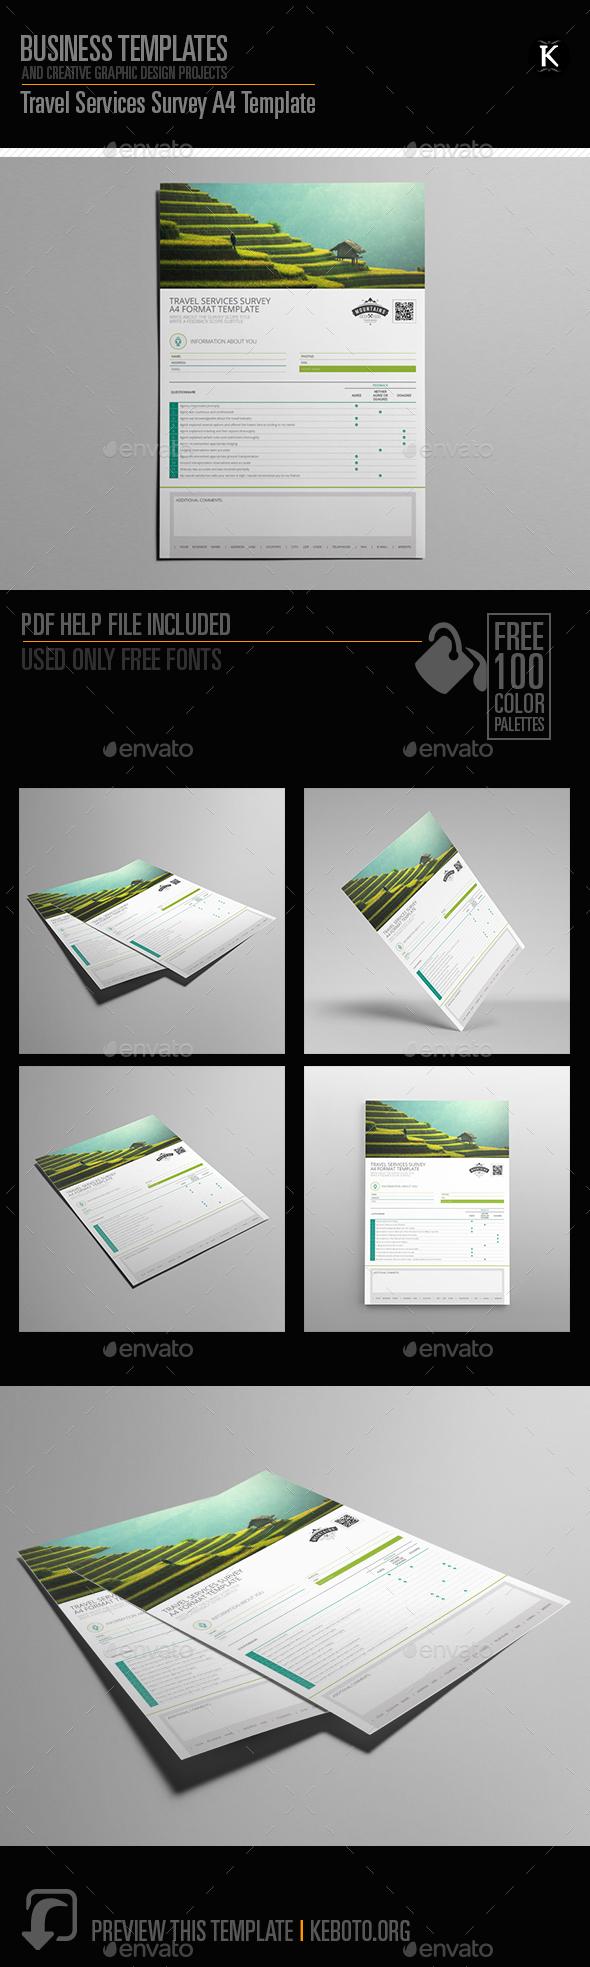 Travel Services Survey A4 Template - Miscellaneous Print Templates